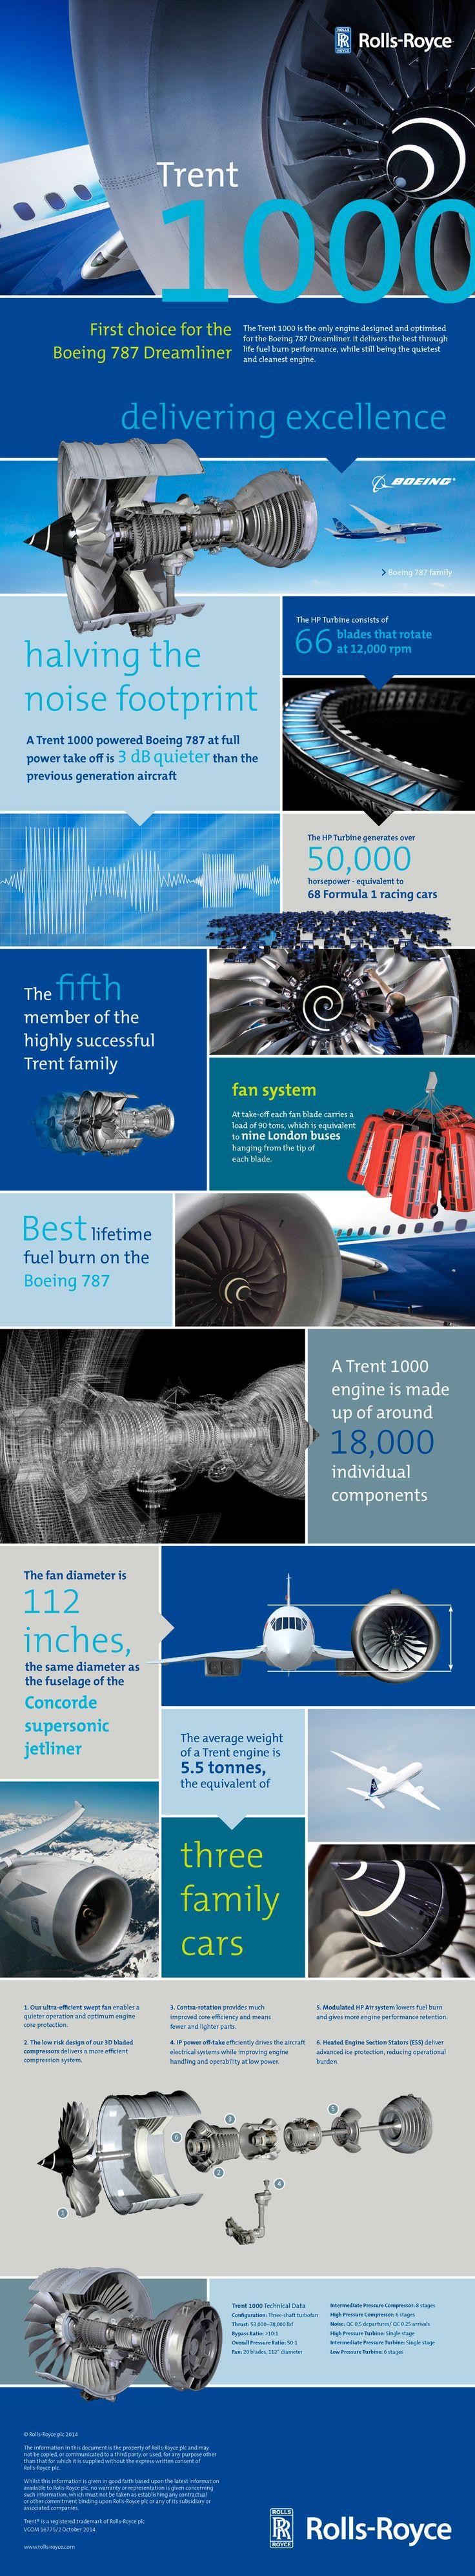 The bleed less engine - Rolls-Royce Trent 1000